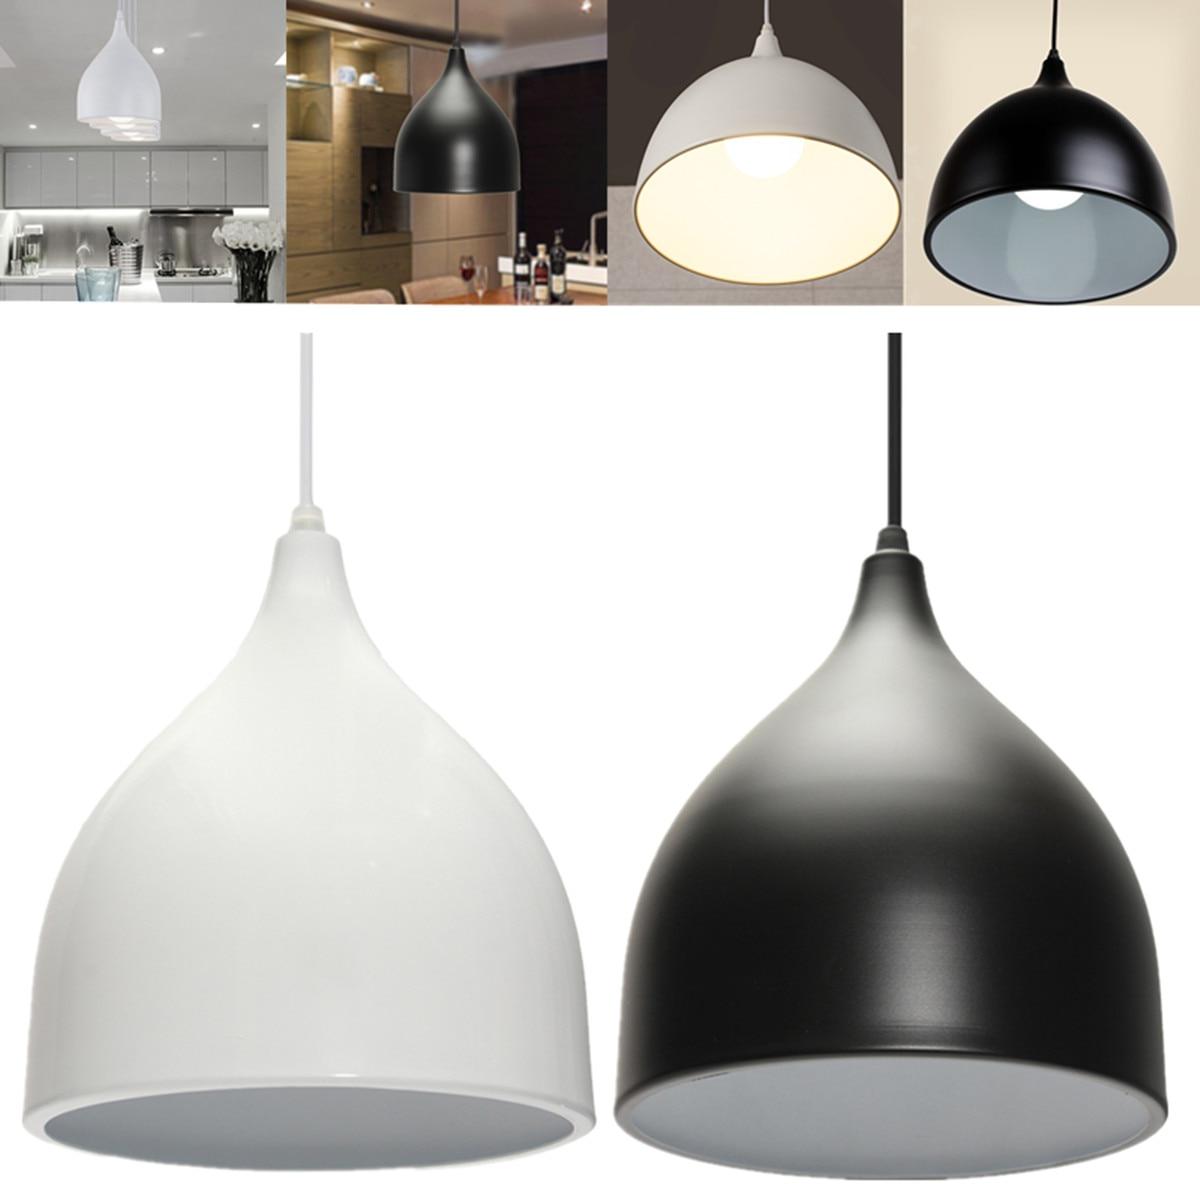 17cm Retro VintageAluminum Single Head Pendant Light Cover Lamp Shape for Restaurant Lamps Dining Room все цены